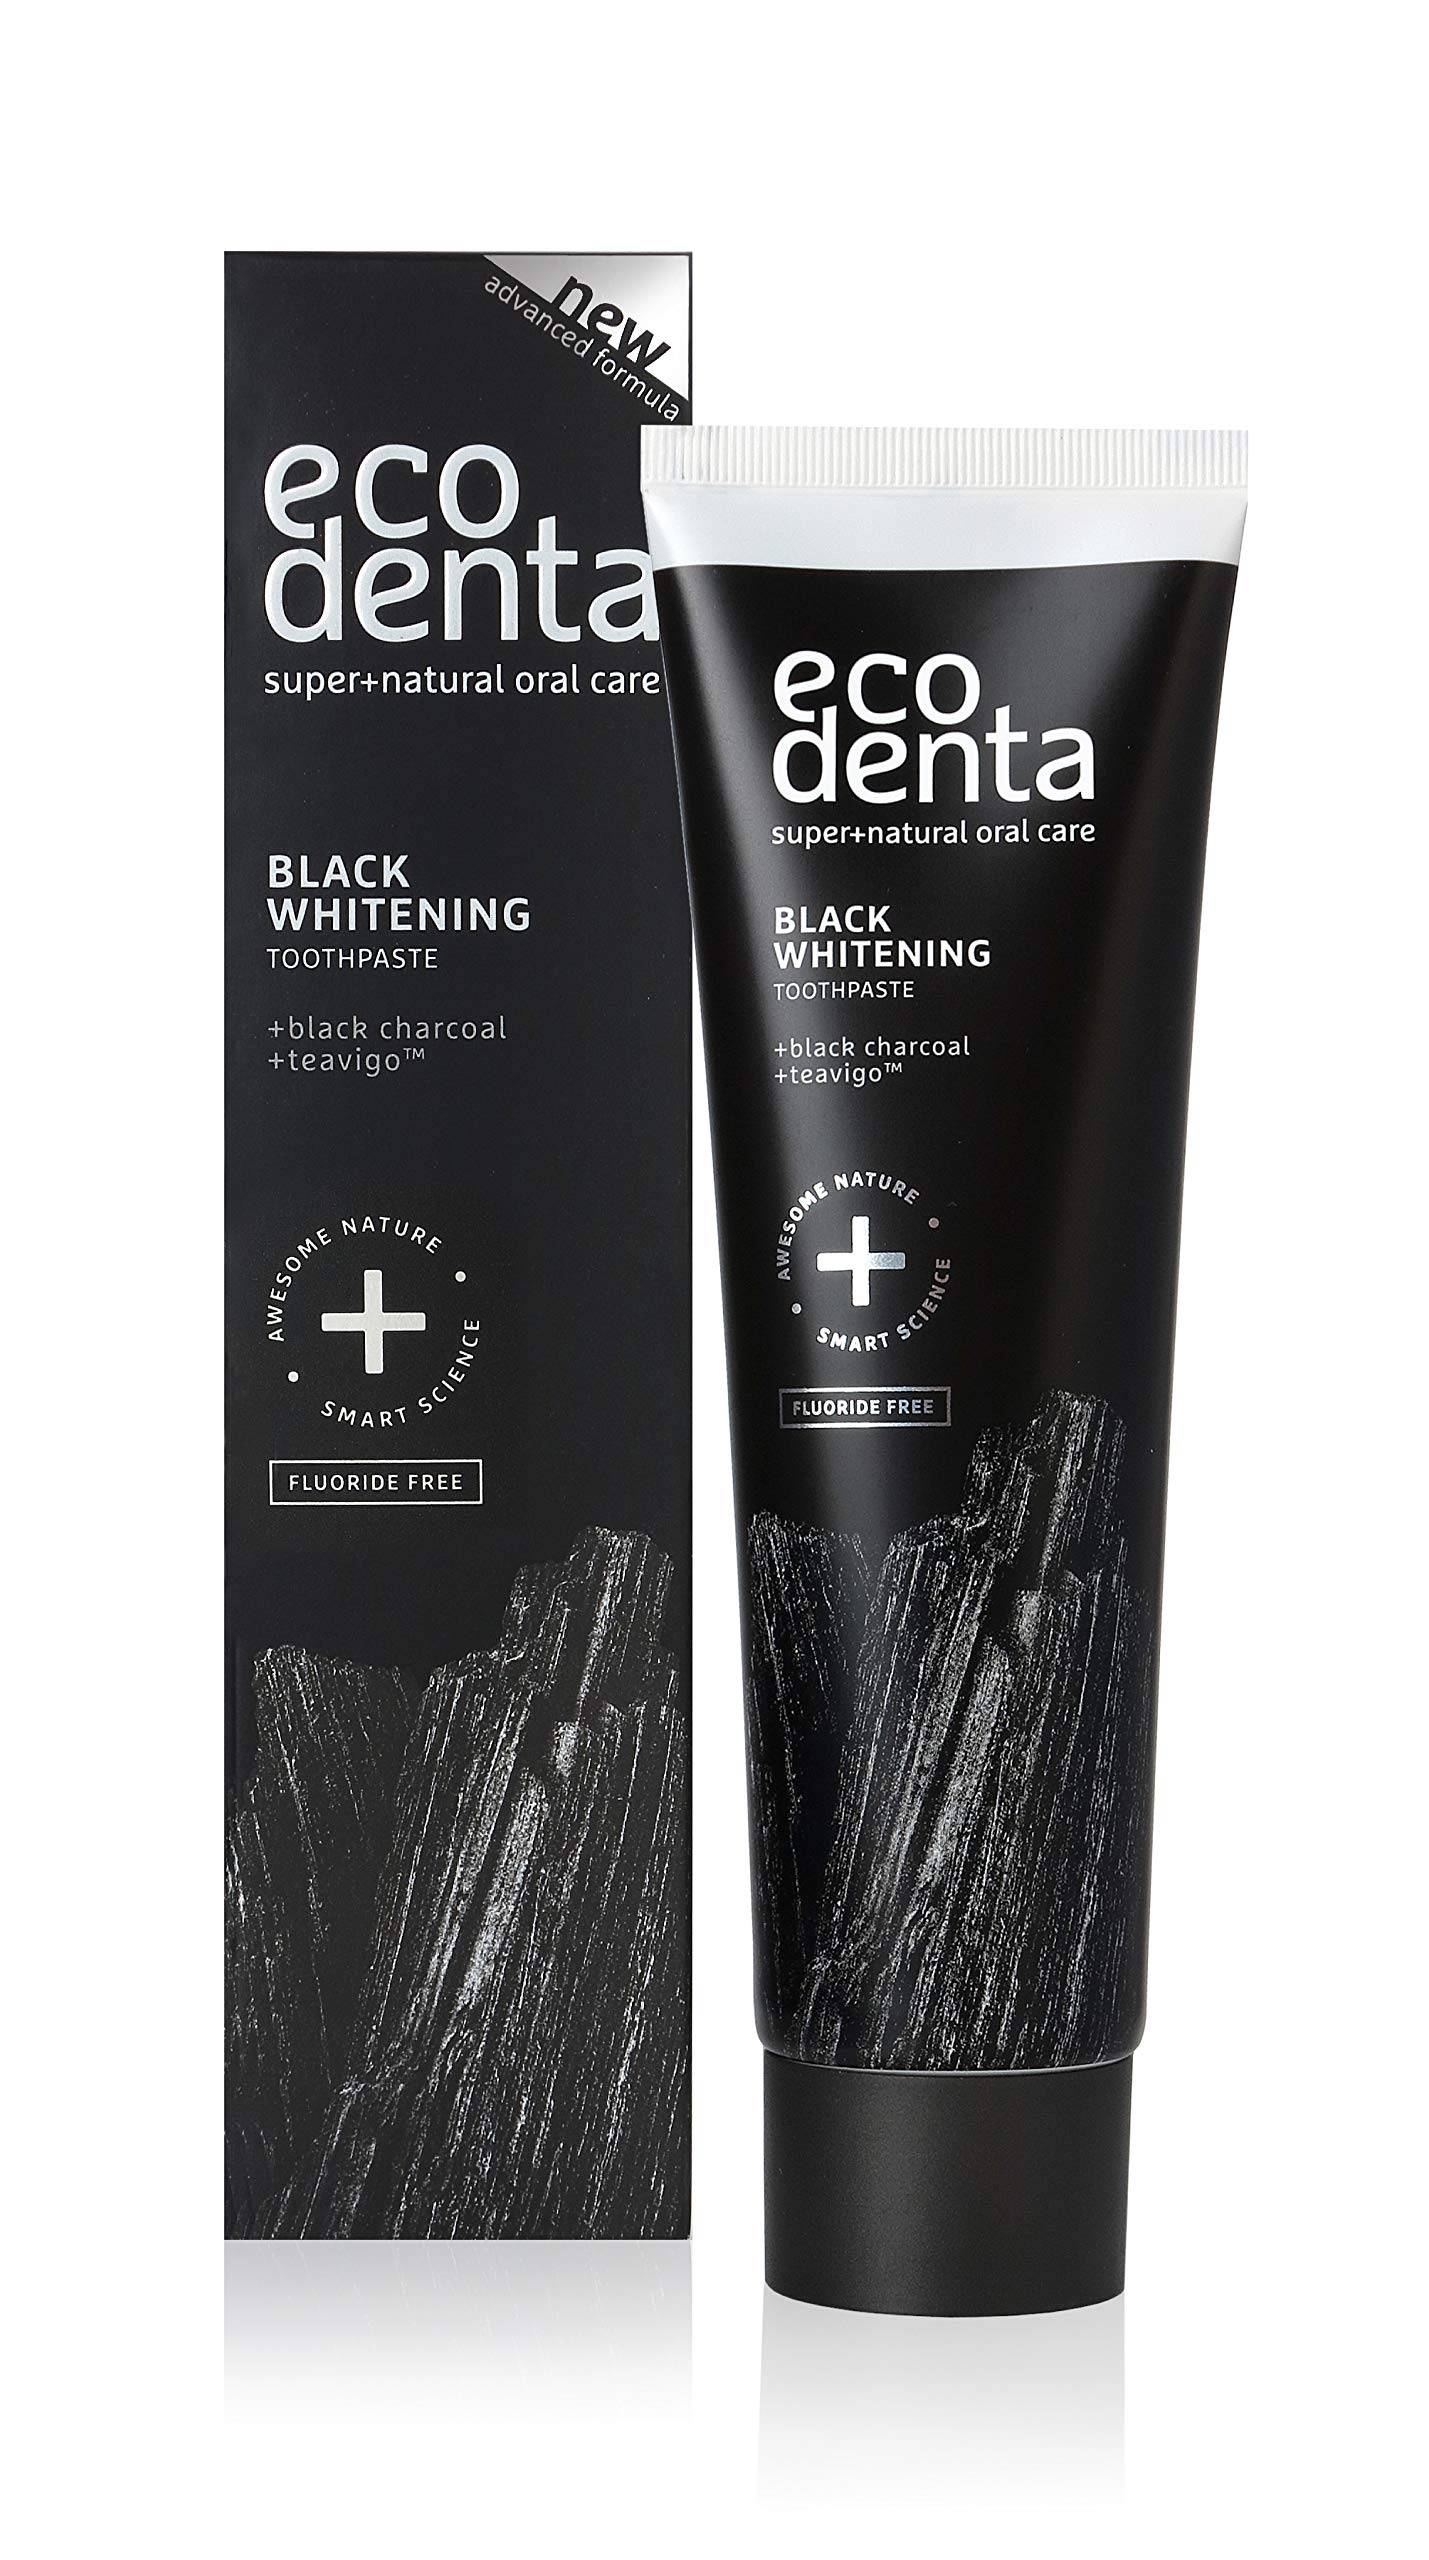 Ecodenta Charcoal and Teavigo Whitening Toothpaste, 3.4 Ounce